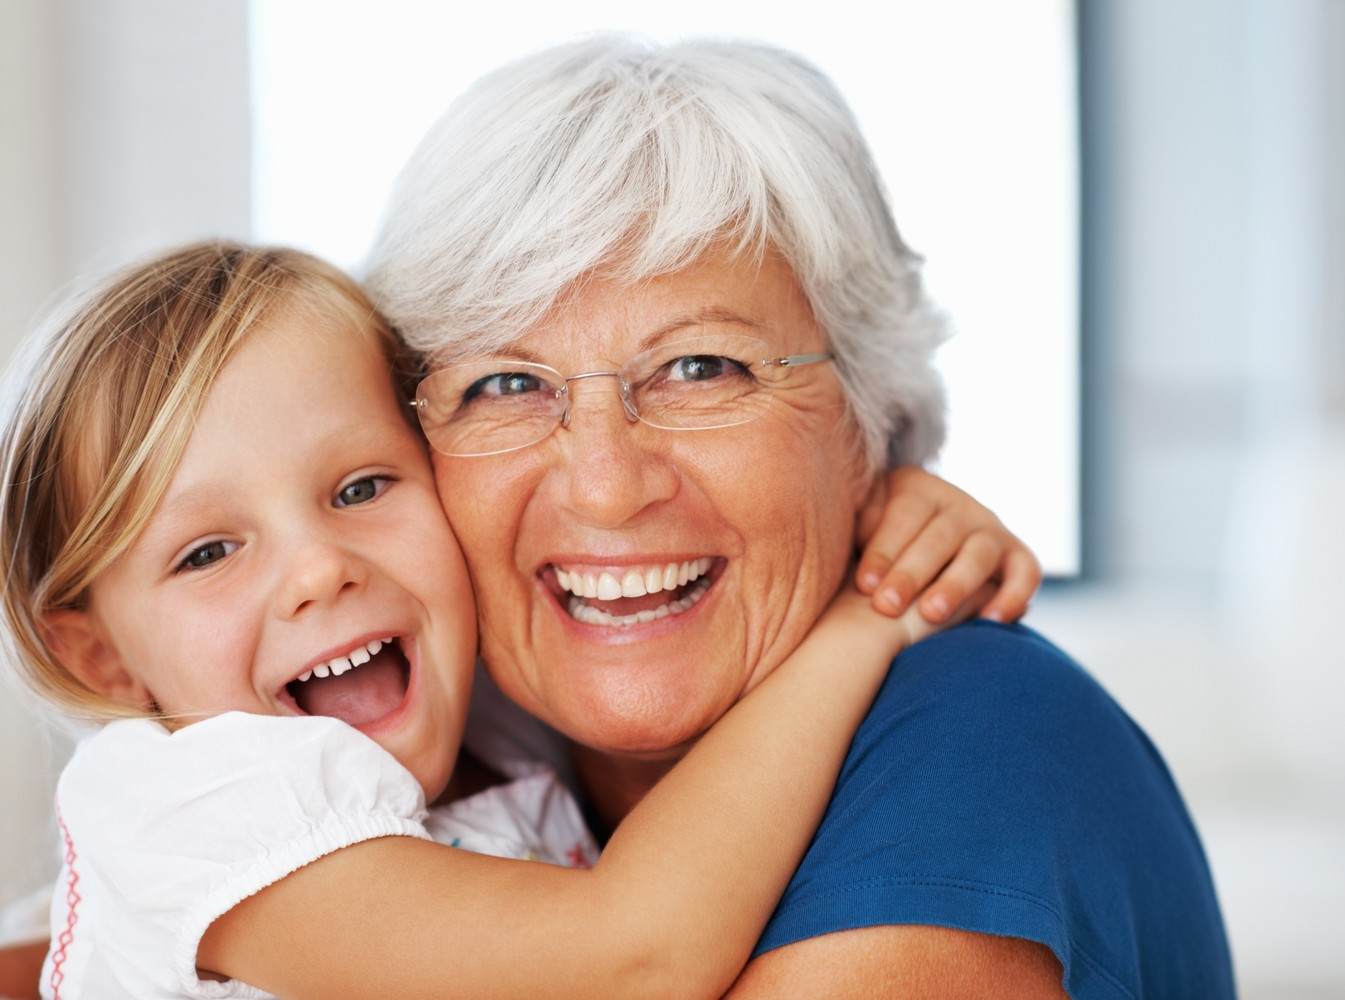 Сех бабушка с вунукам 5 фотография